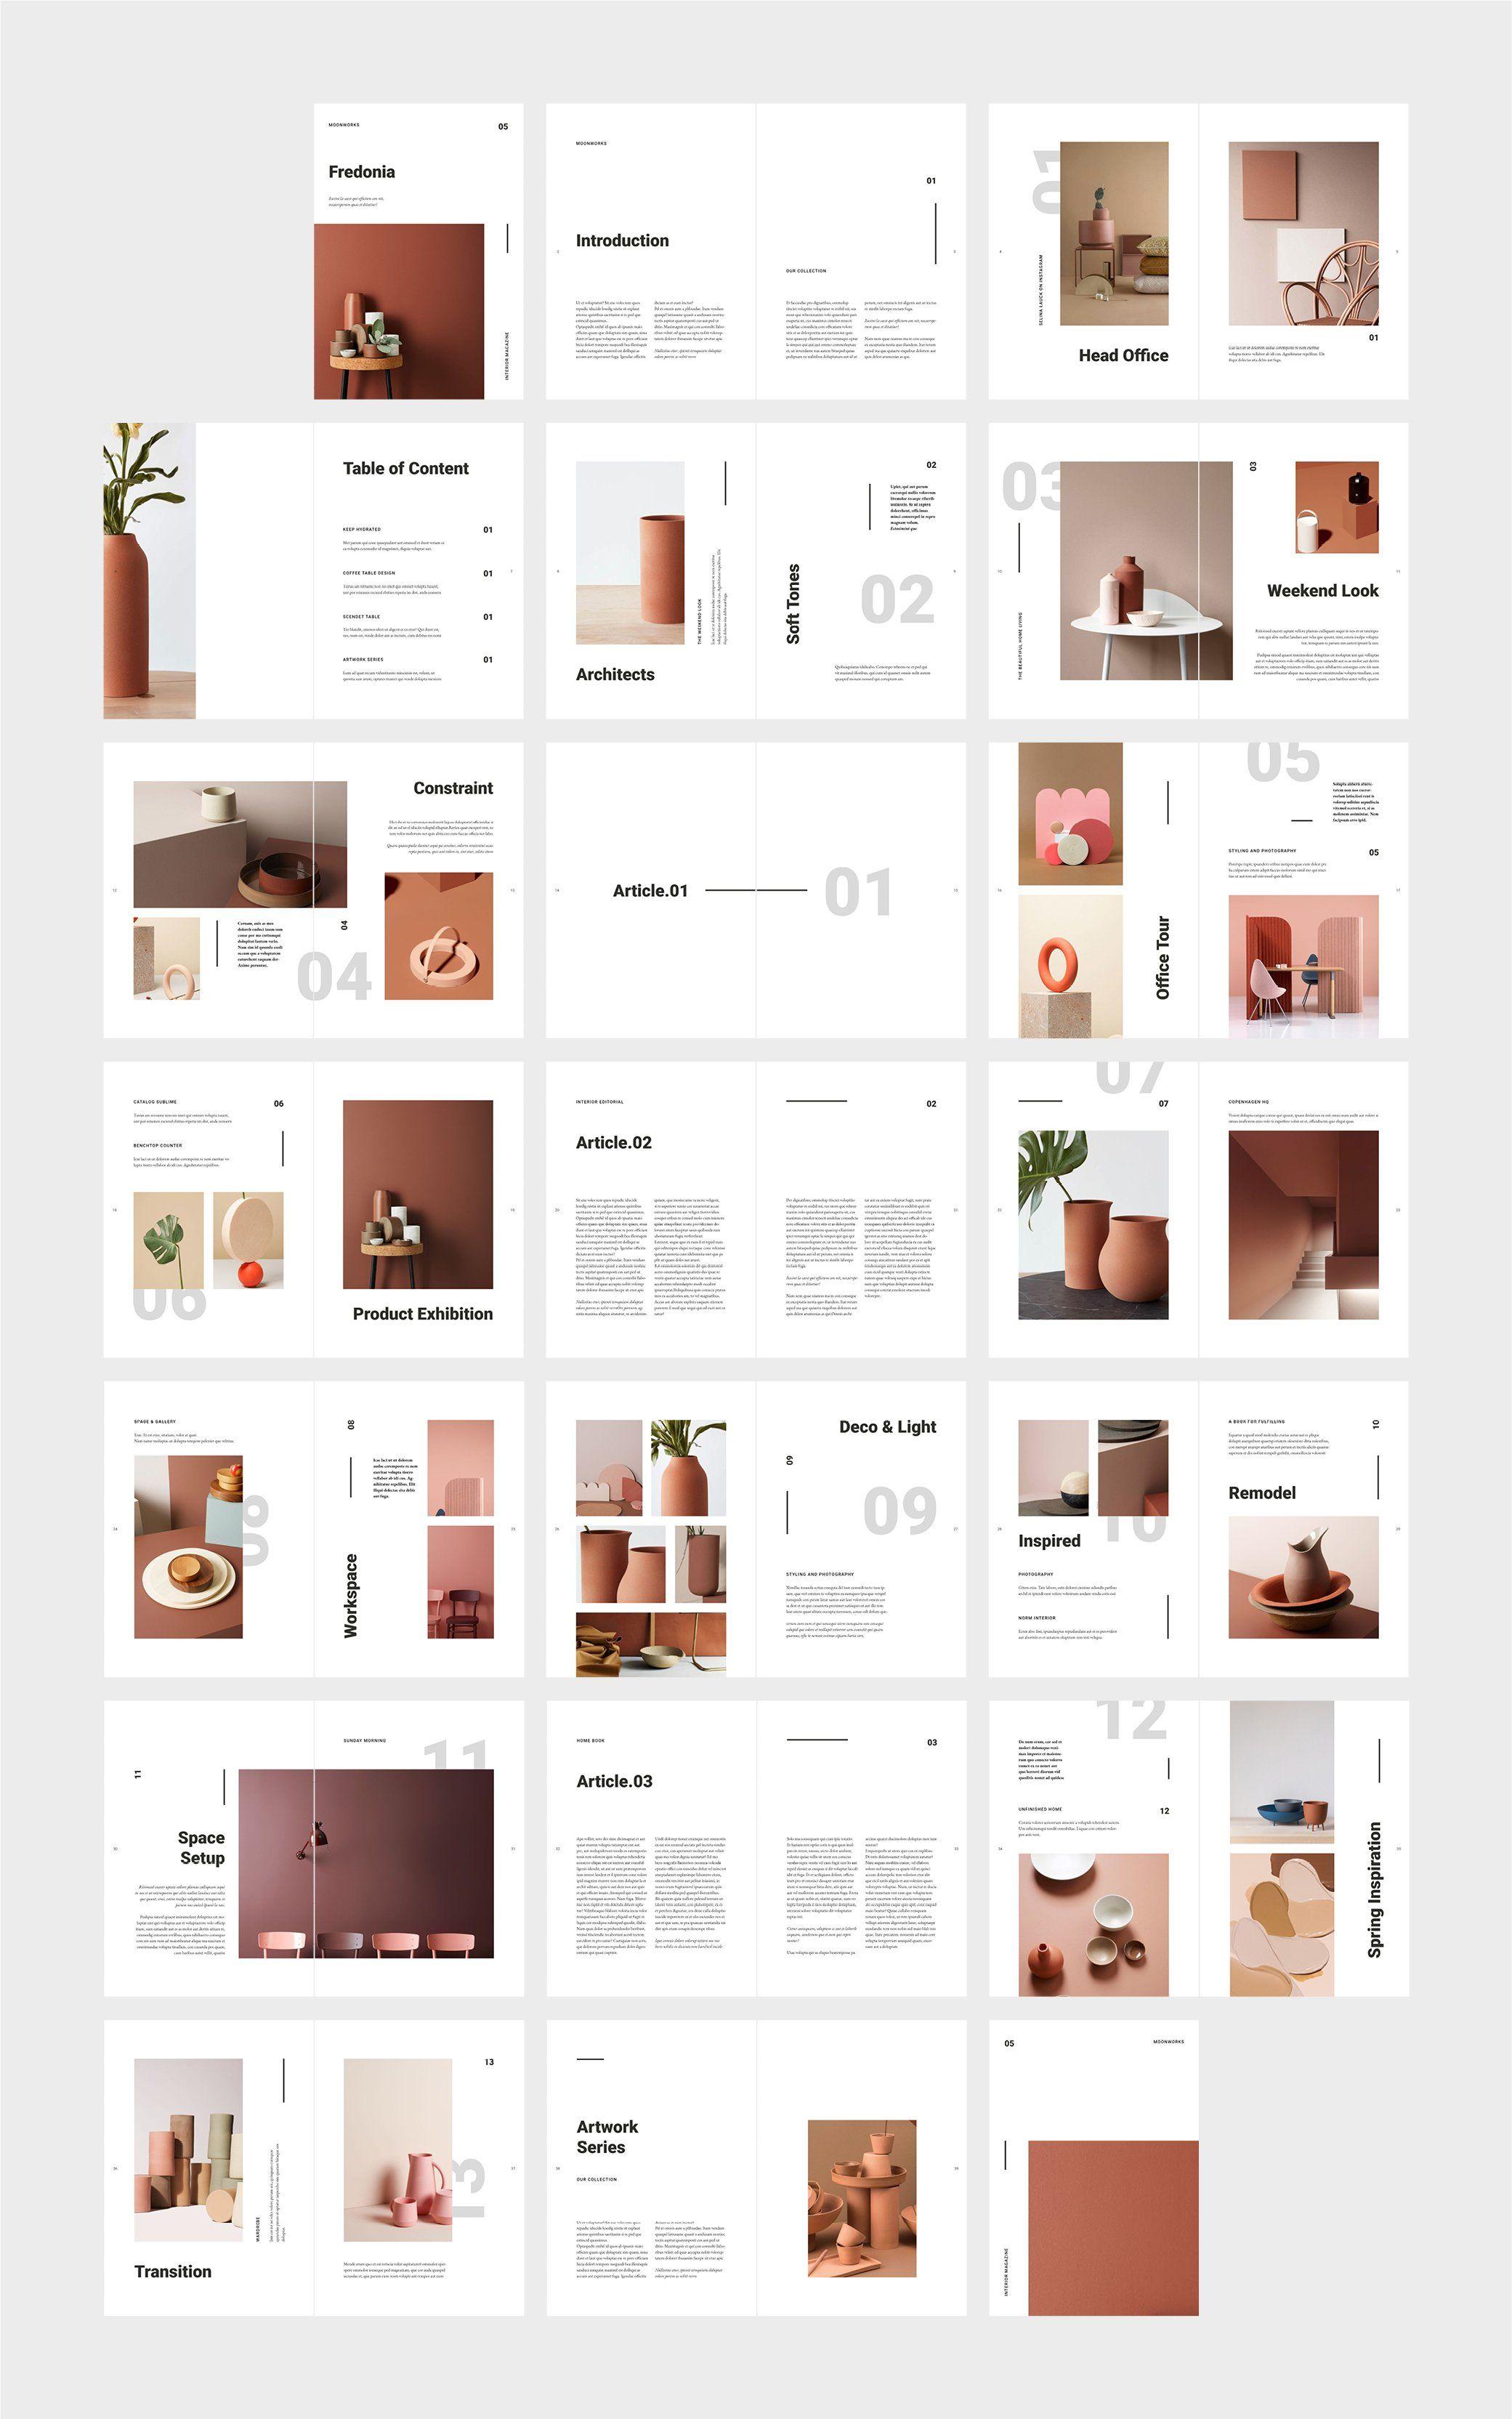 Fredonia Home Decor Catalog 인쇄 레이아웃 레이아웃 레이아웃 템플릿